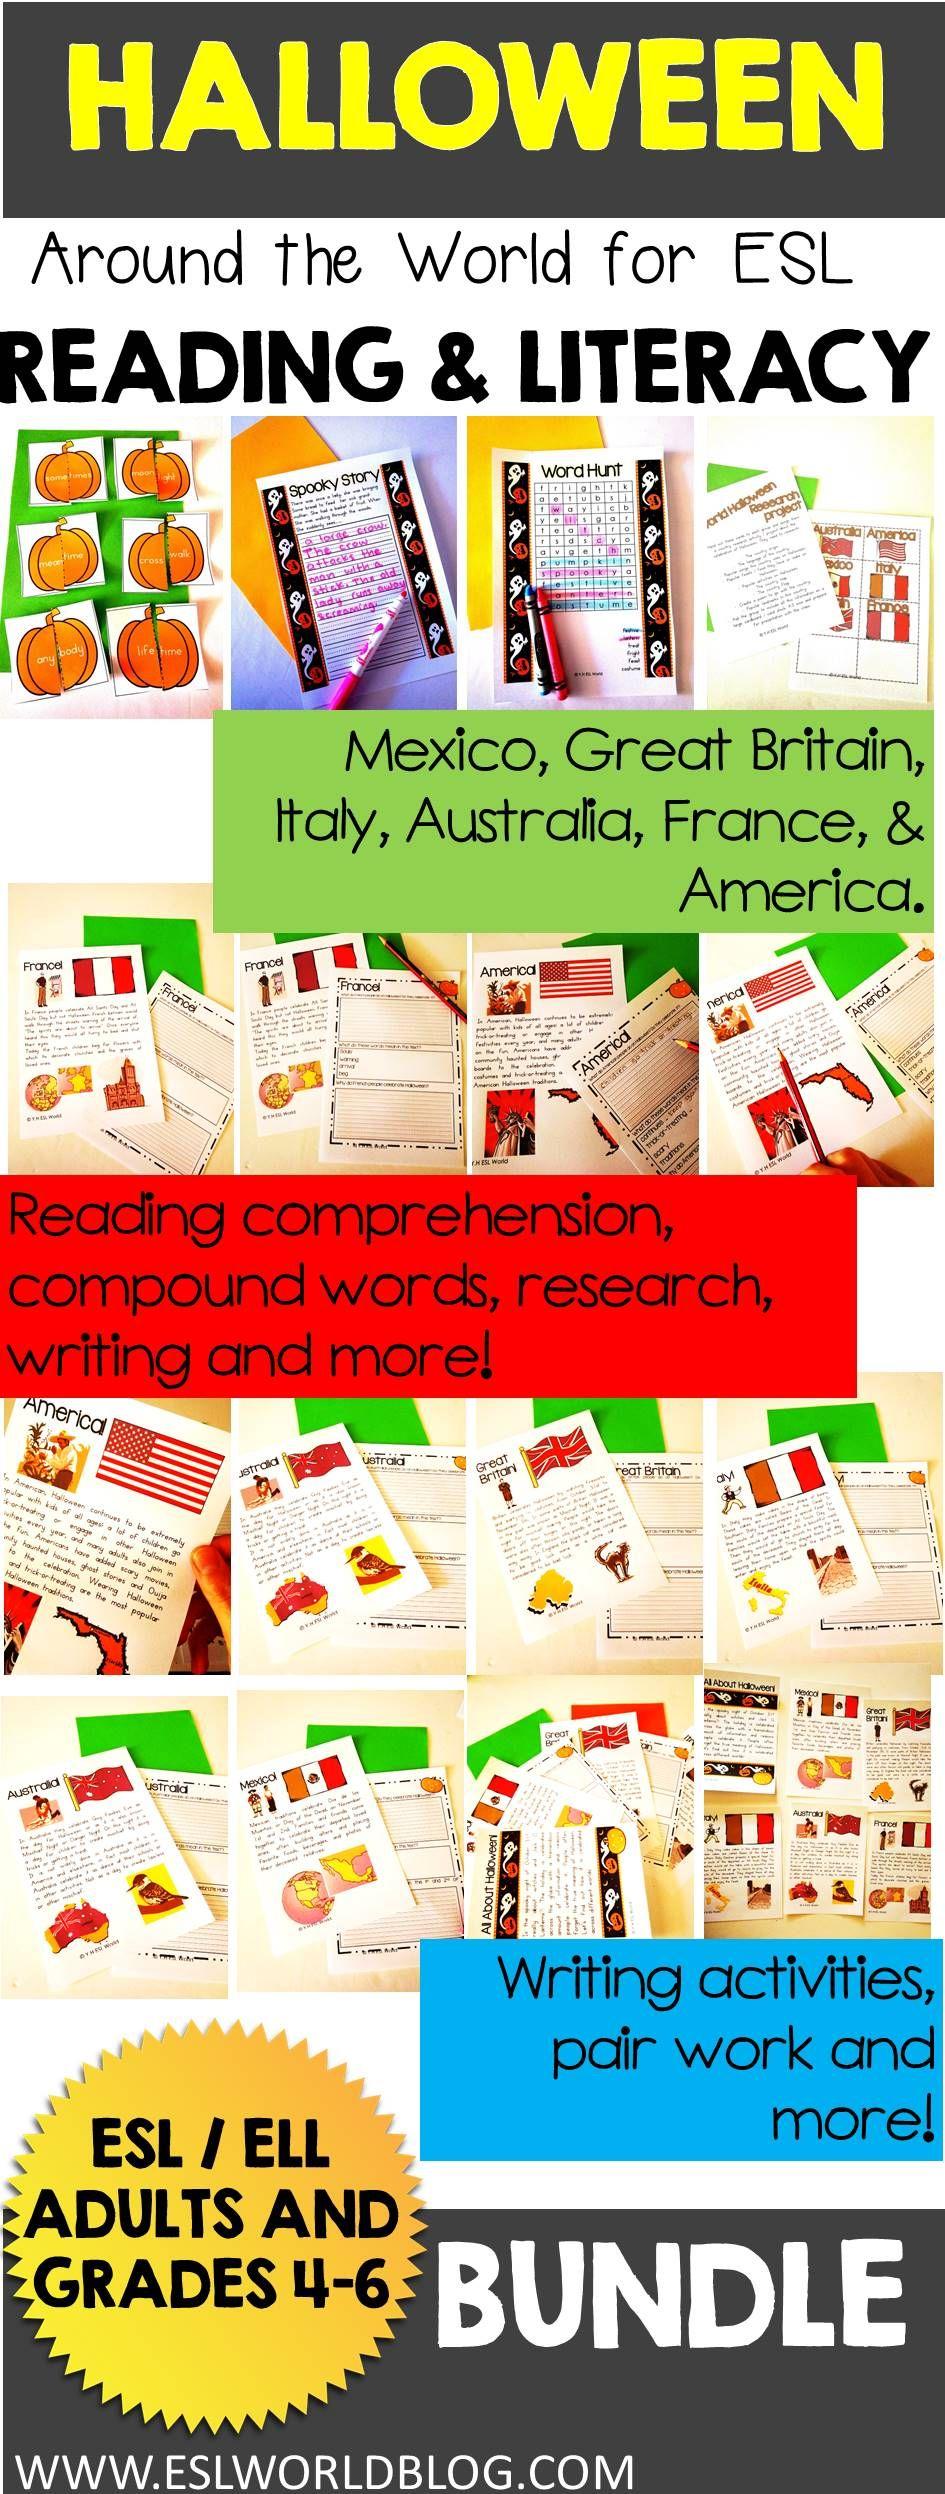 Halloween Around the World Reading and Literacy Activities